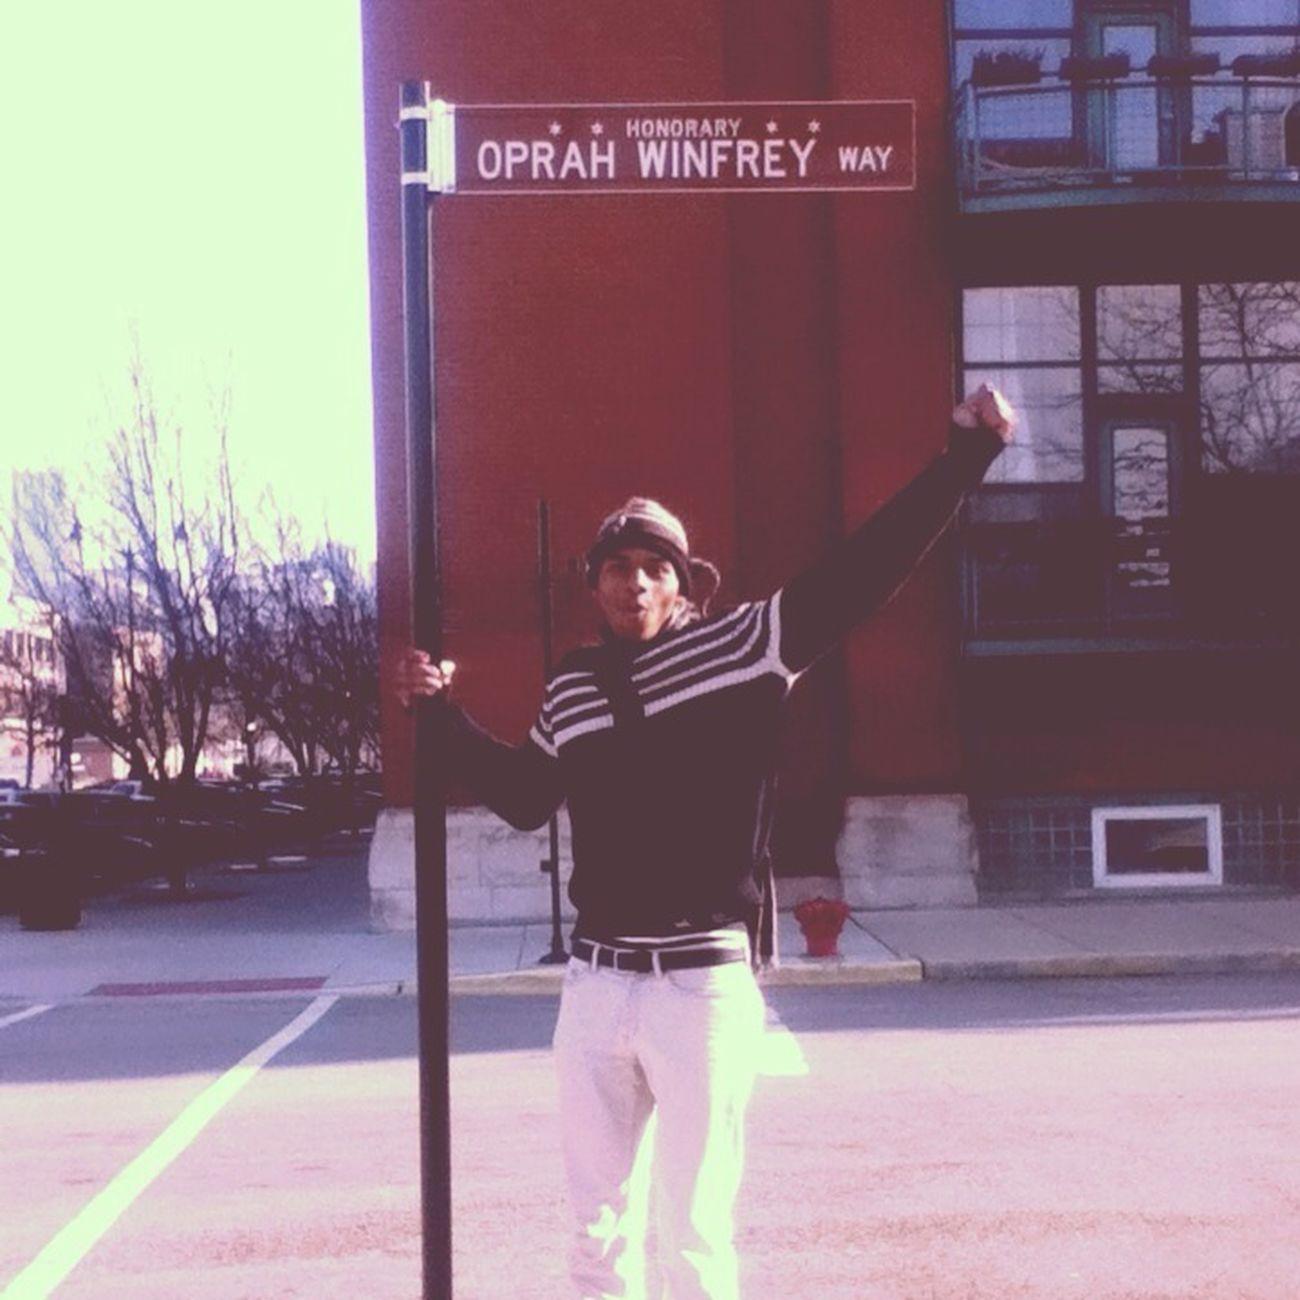 Oprah Winfrey Studios